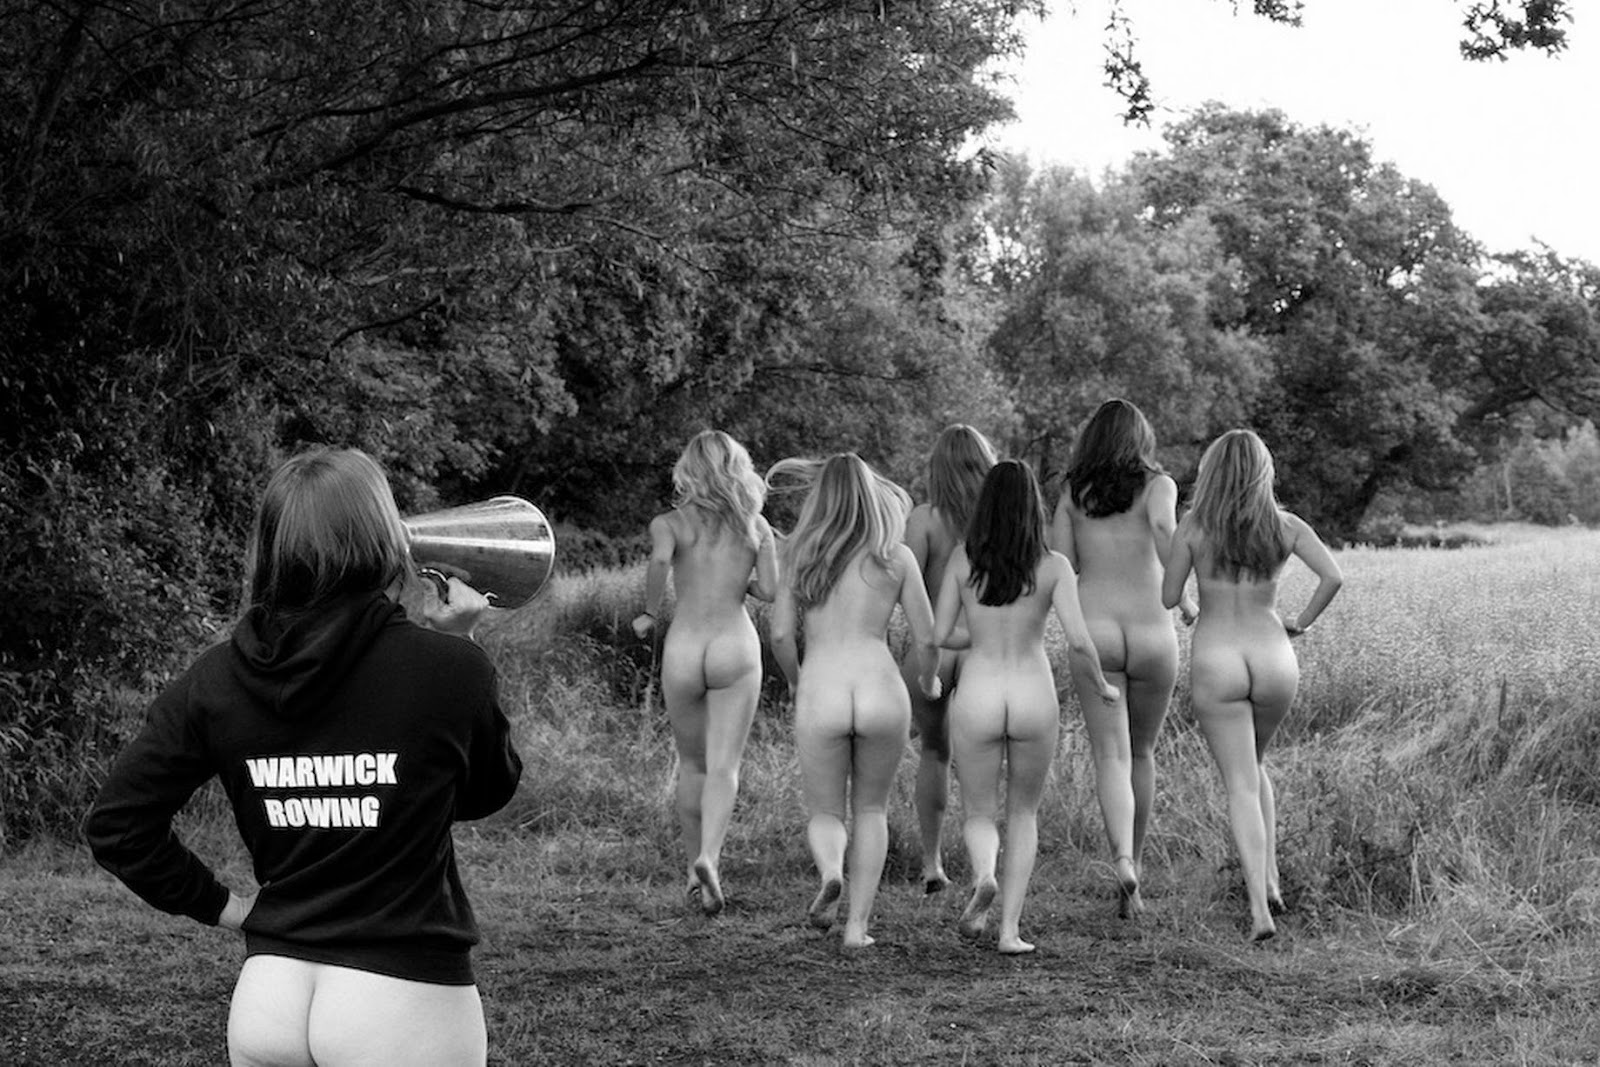 Female University Rowing Club Nude Calendar, University of Warwick female rowing club nude, girls rowing club nude, naked